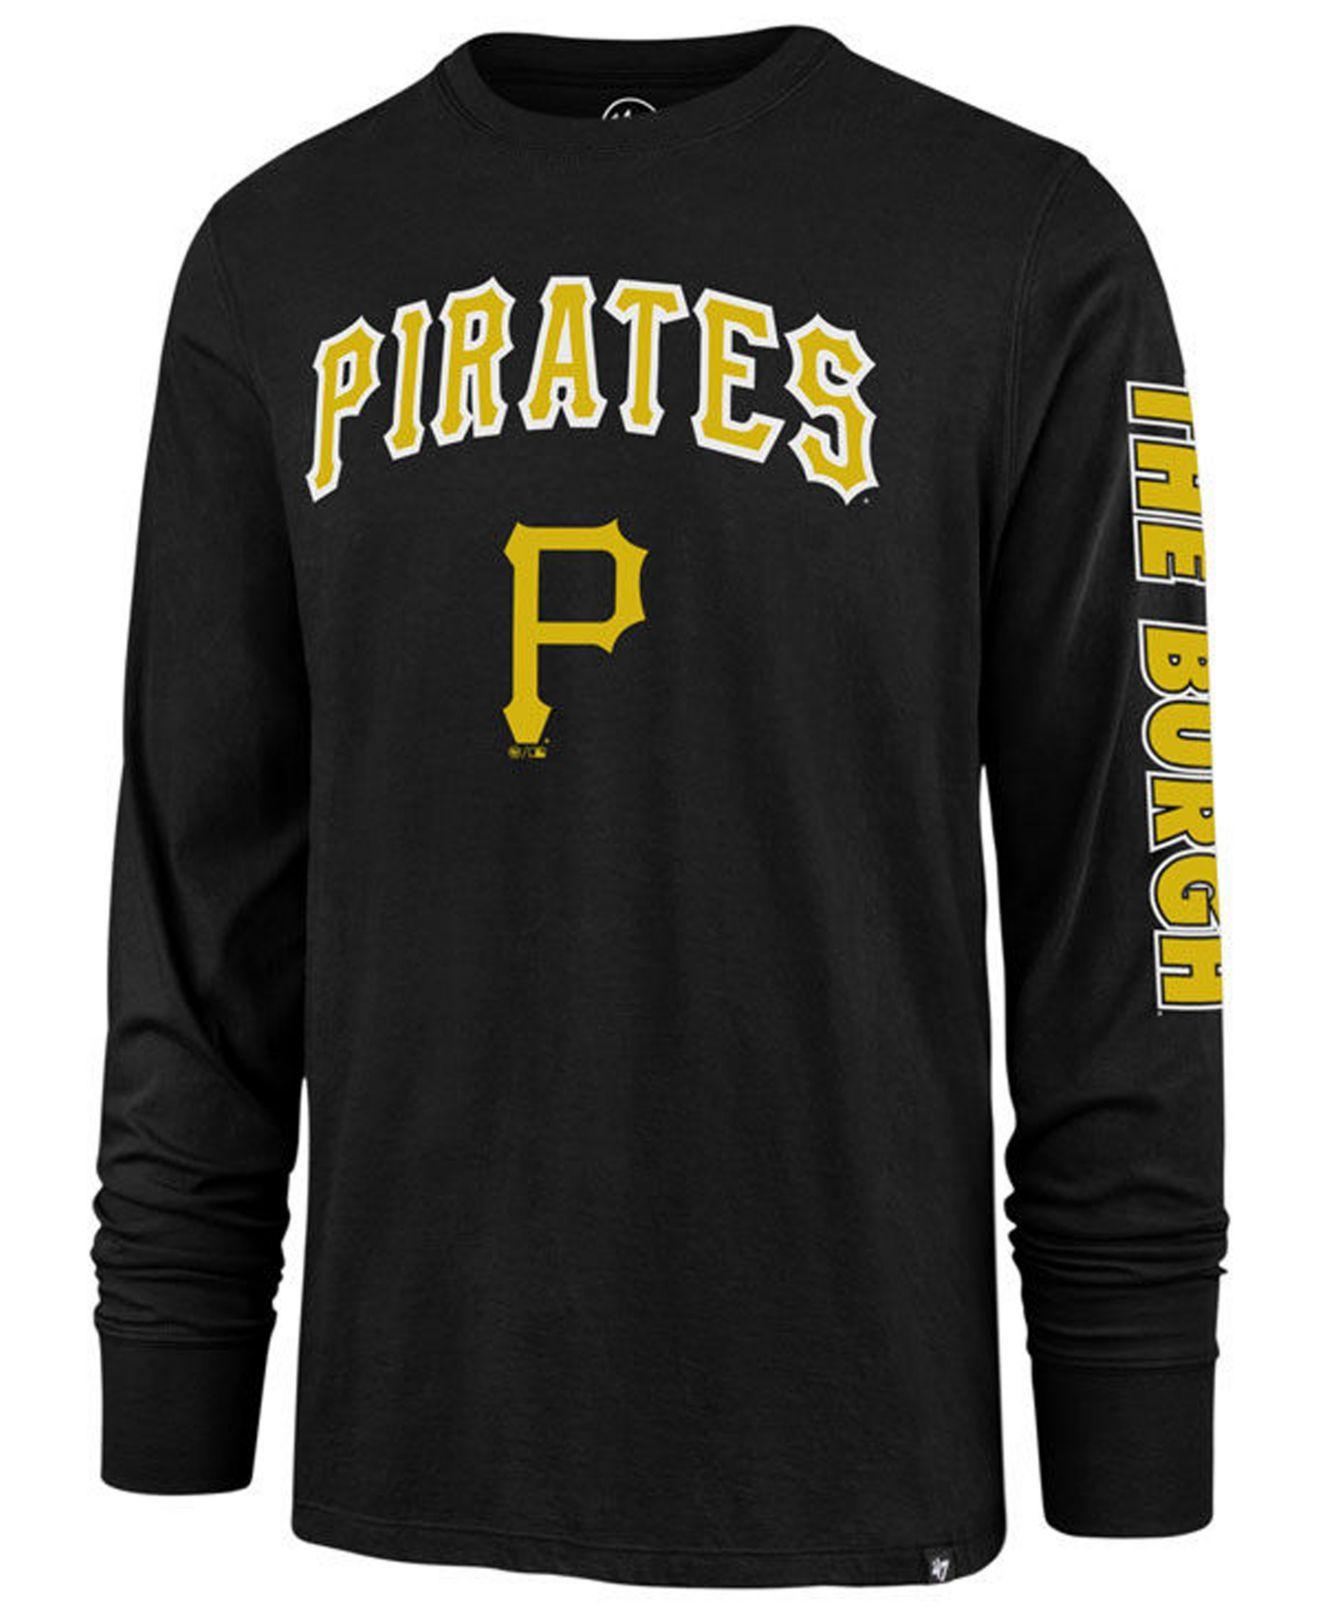 9569bd6ab 47 Brand. Men s Black Pittsburgh Pirates Rival Local Long Sleeve T-shirt